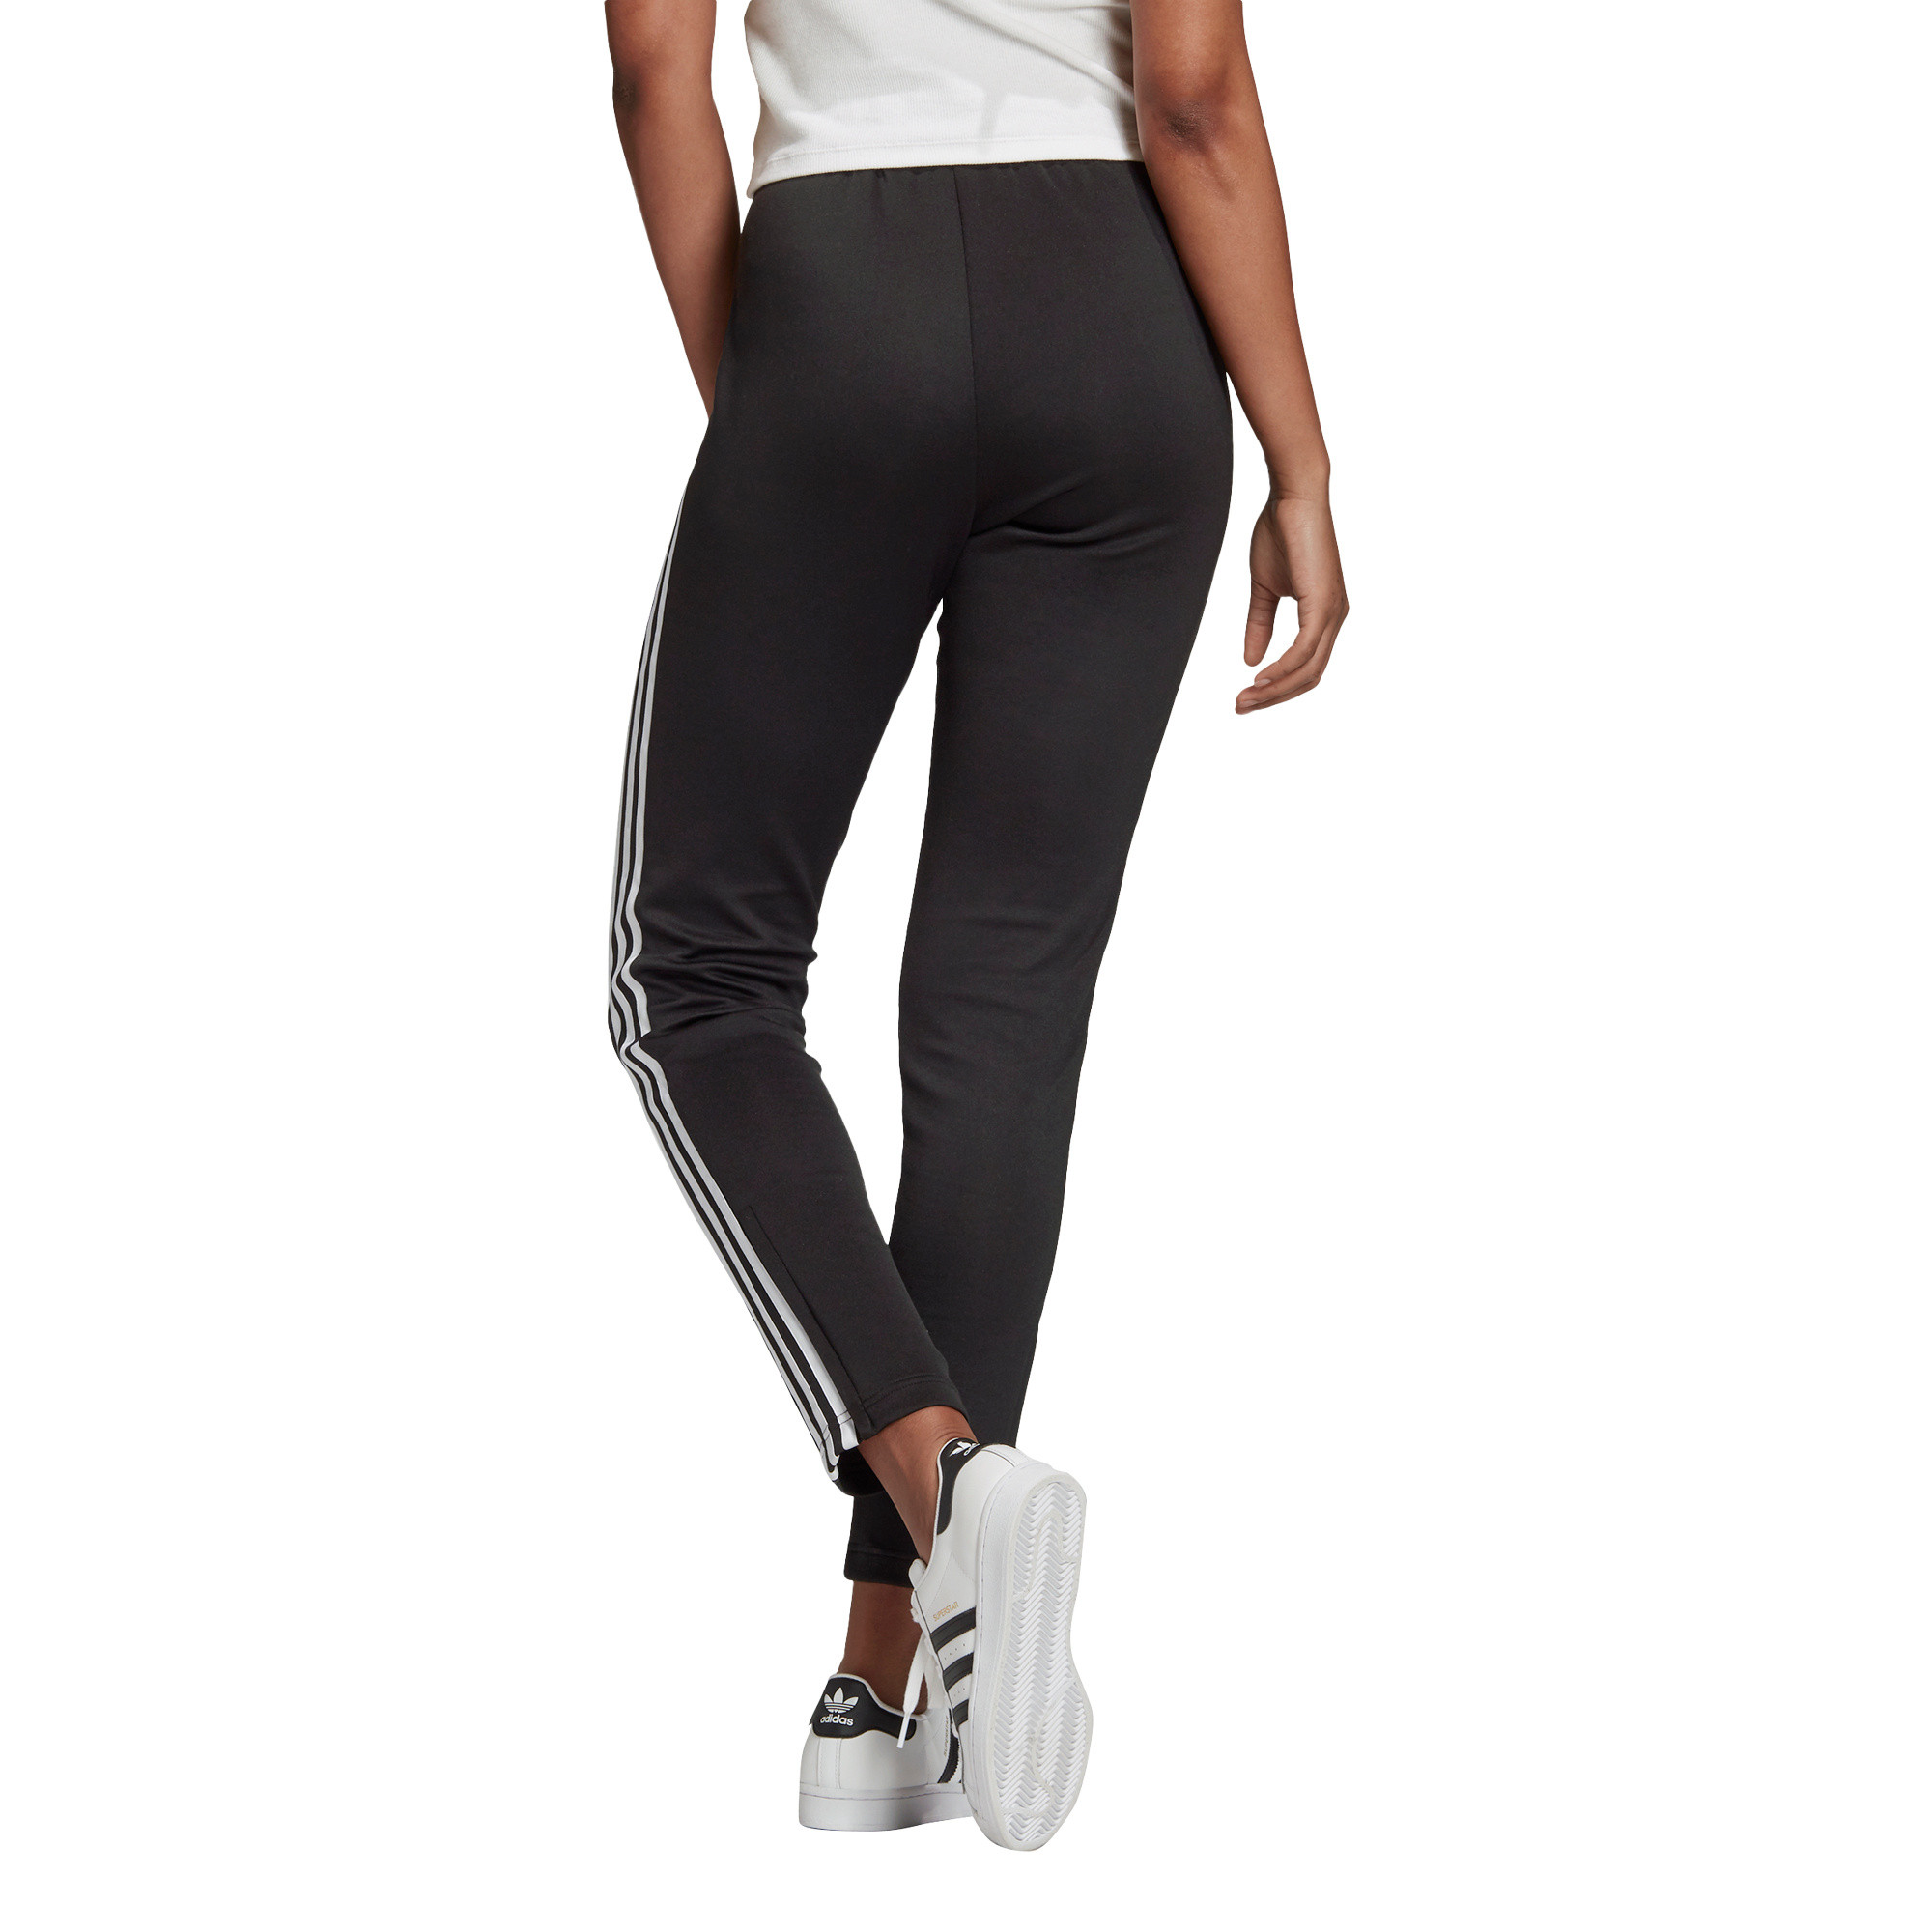 Pantaloni tuta Primeblue SST, Bianco/Nero, large image number 5